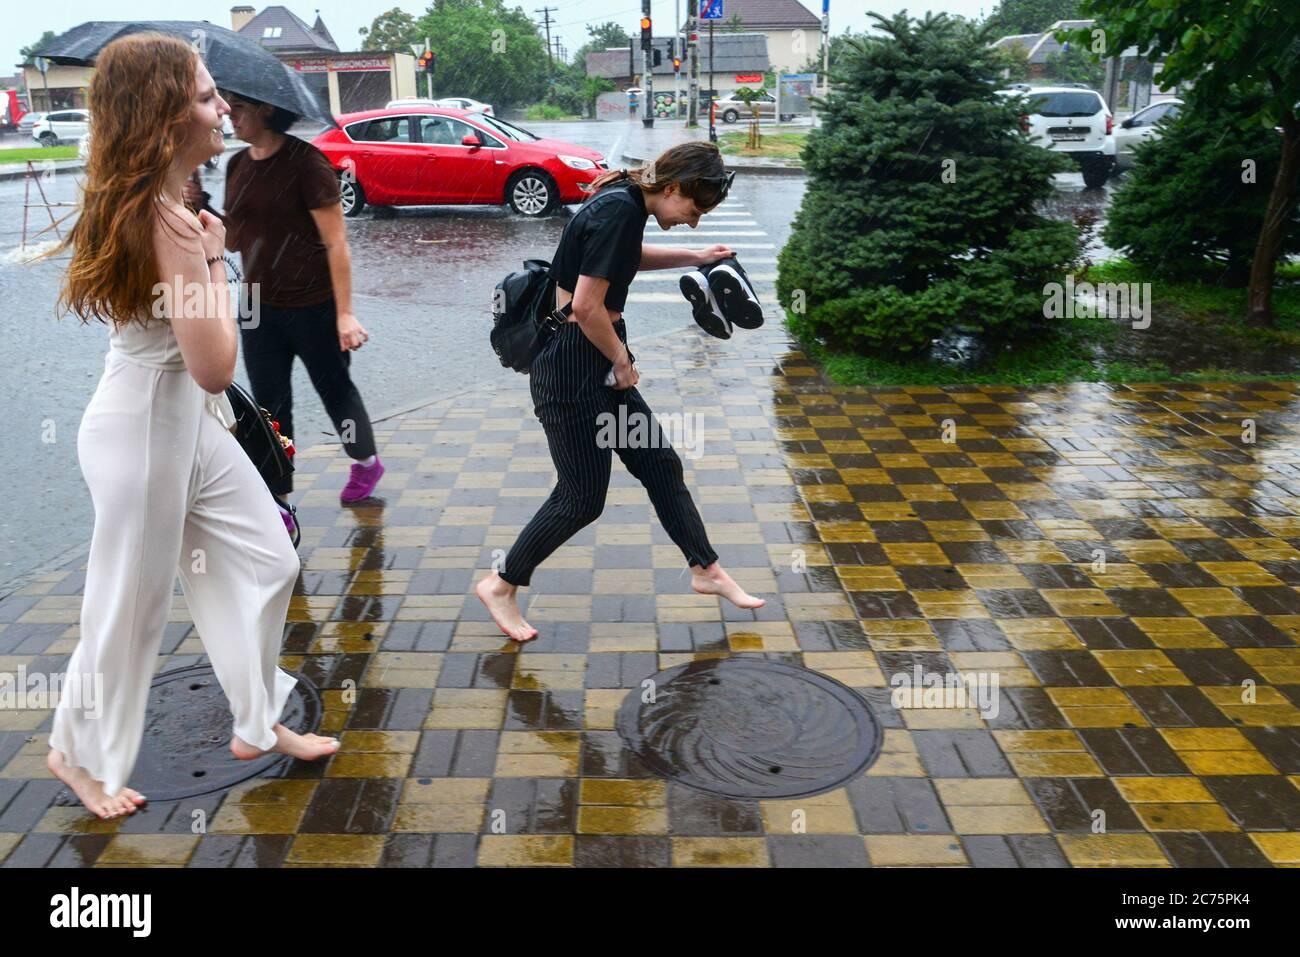 https://c7.alamy.com/comp/2C75PK4/krasnodar-russia-14th-july-2020-two-women-walk-barefoot-in-a-street-during-a-heavy-rain-credit-igor-onuchintassalamy-live-news-2C75PK4.jpg